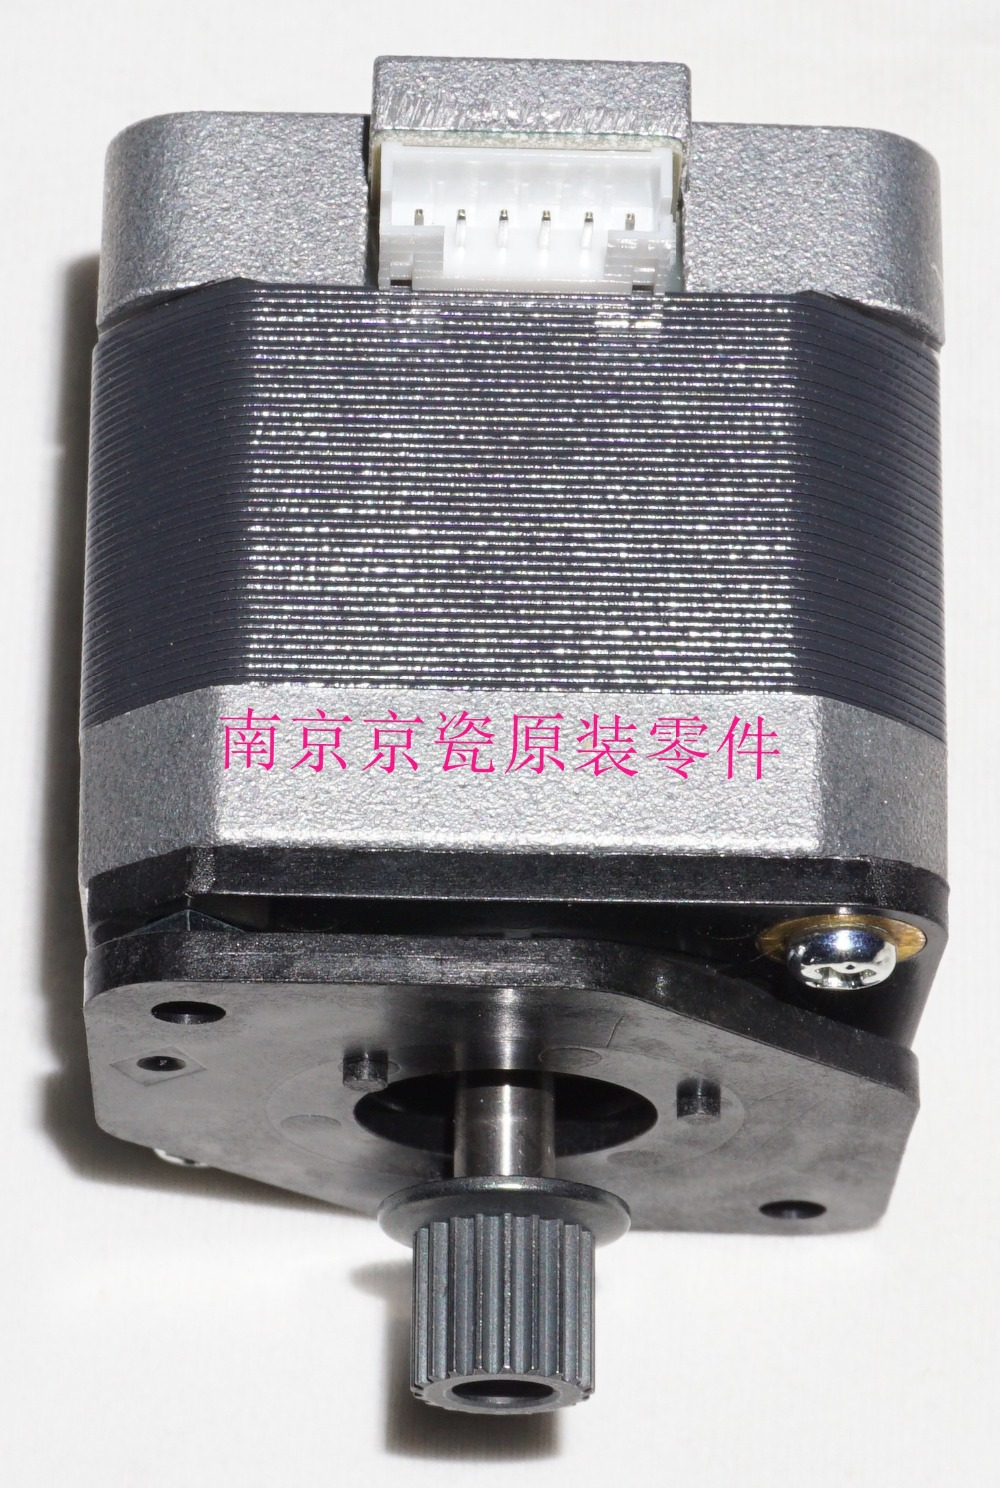 New Original Kyocera DP-771 DP-772 303M494040 MOTOR CONVEYING for:TA3010i 3500i-8001i 2551ci 3050ci-7551ci new original kyocera dc motor assy in fk 6701 6702 for ta6501i 8001i